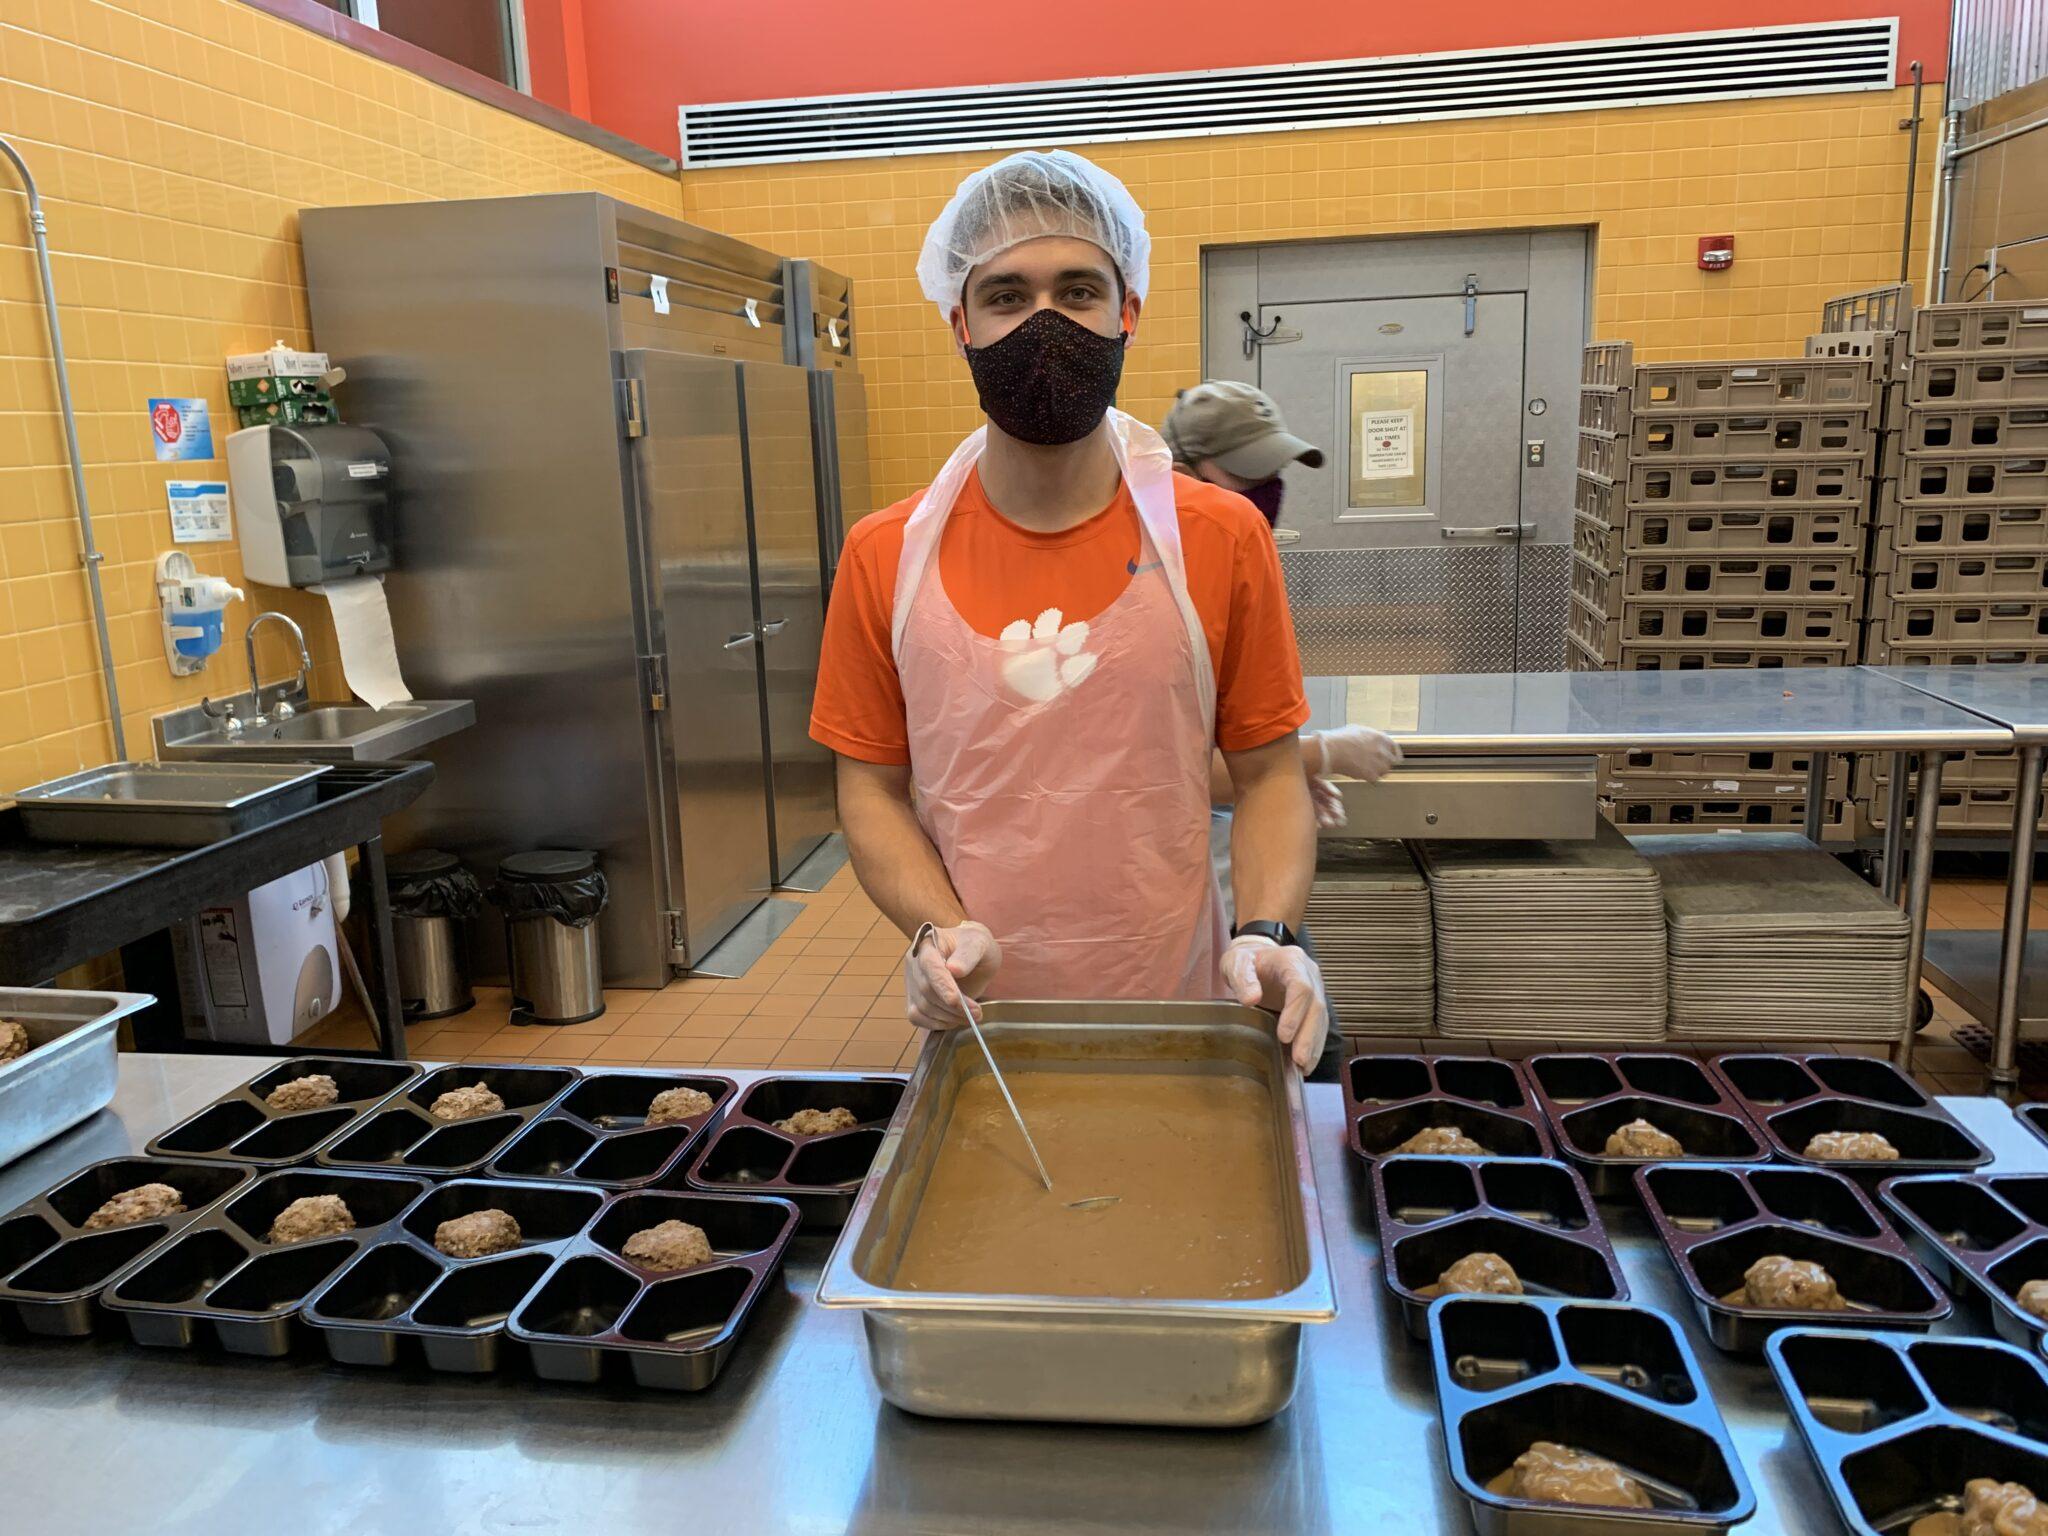 Feed More Community Kitchen volunteer